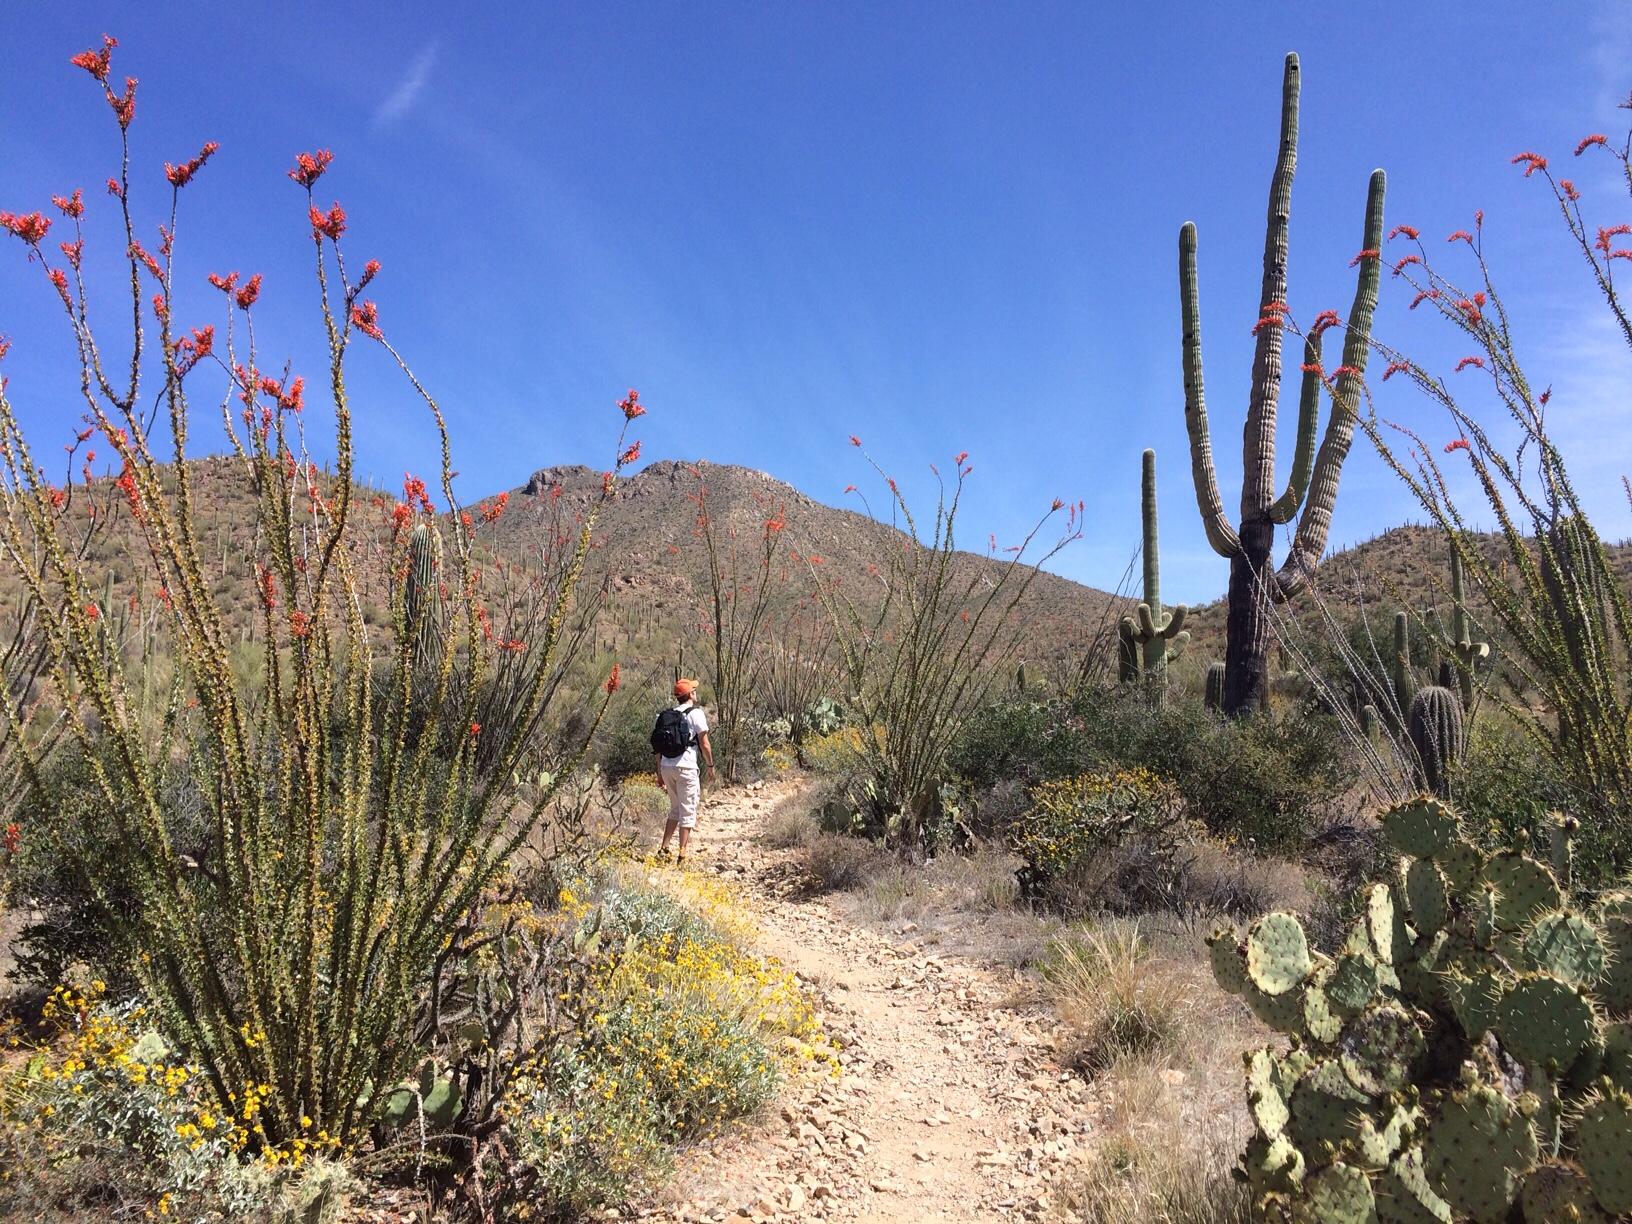 English hubby hiking on kings canyon trail